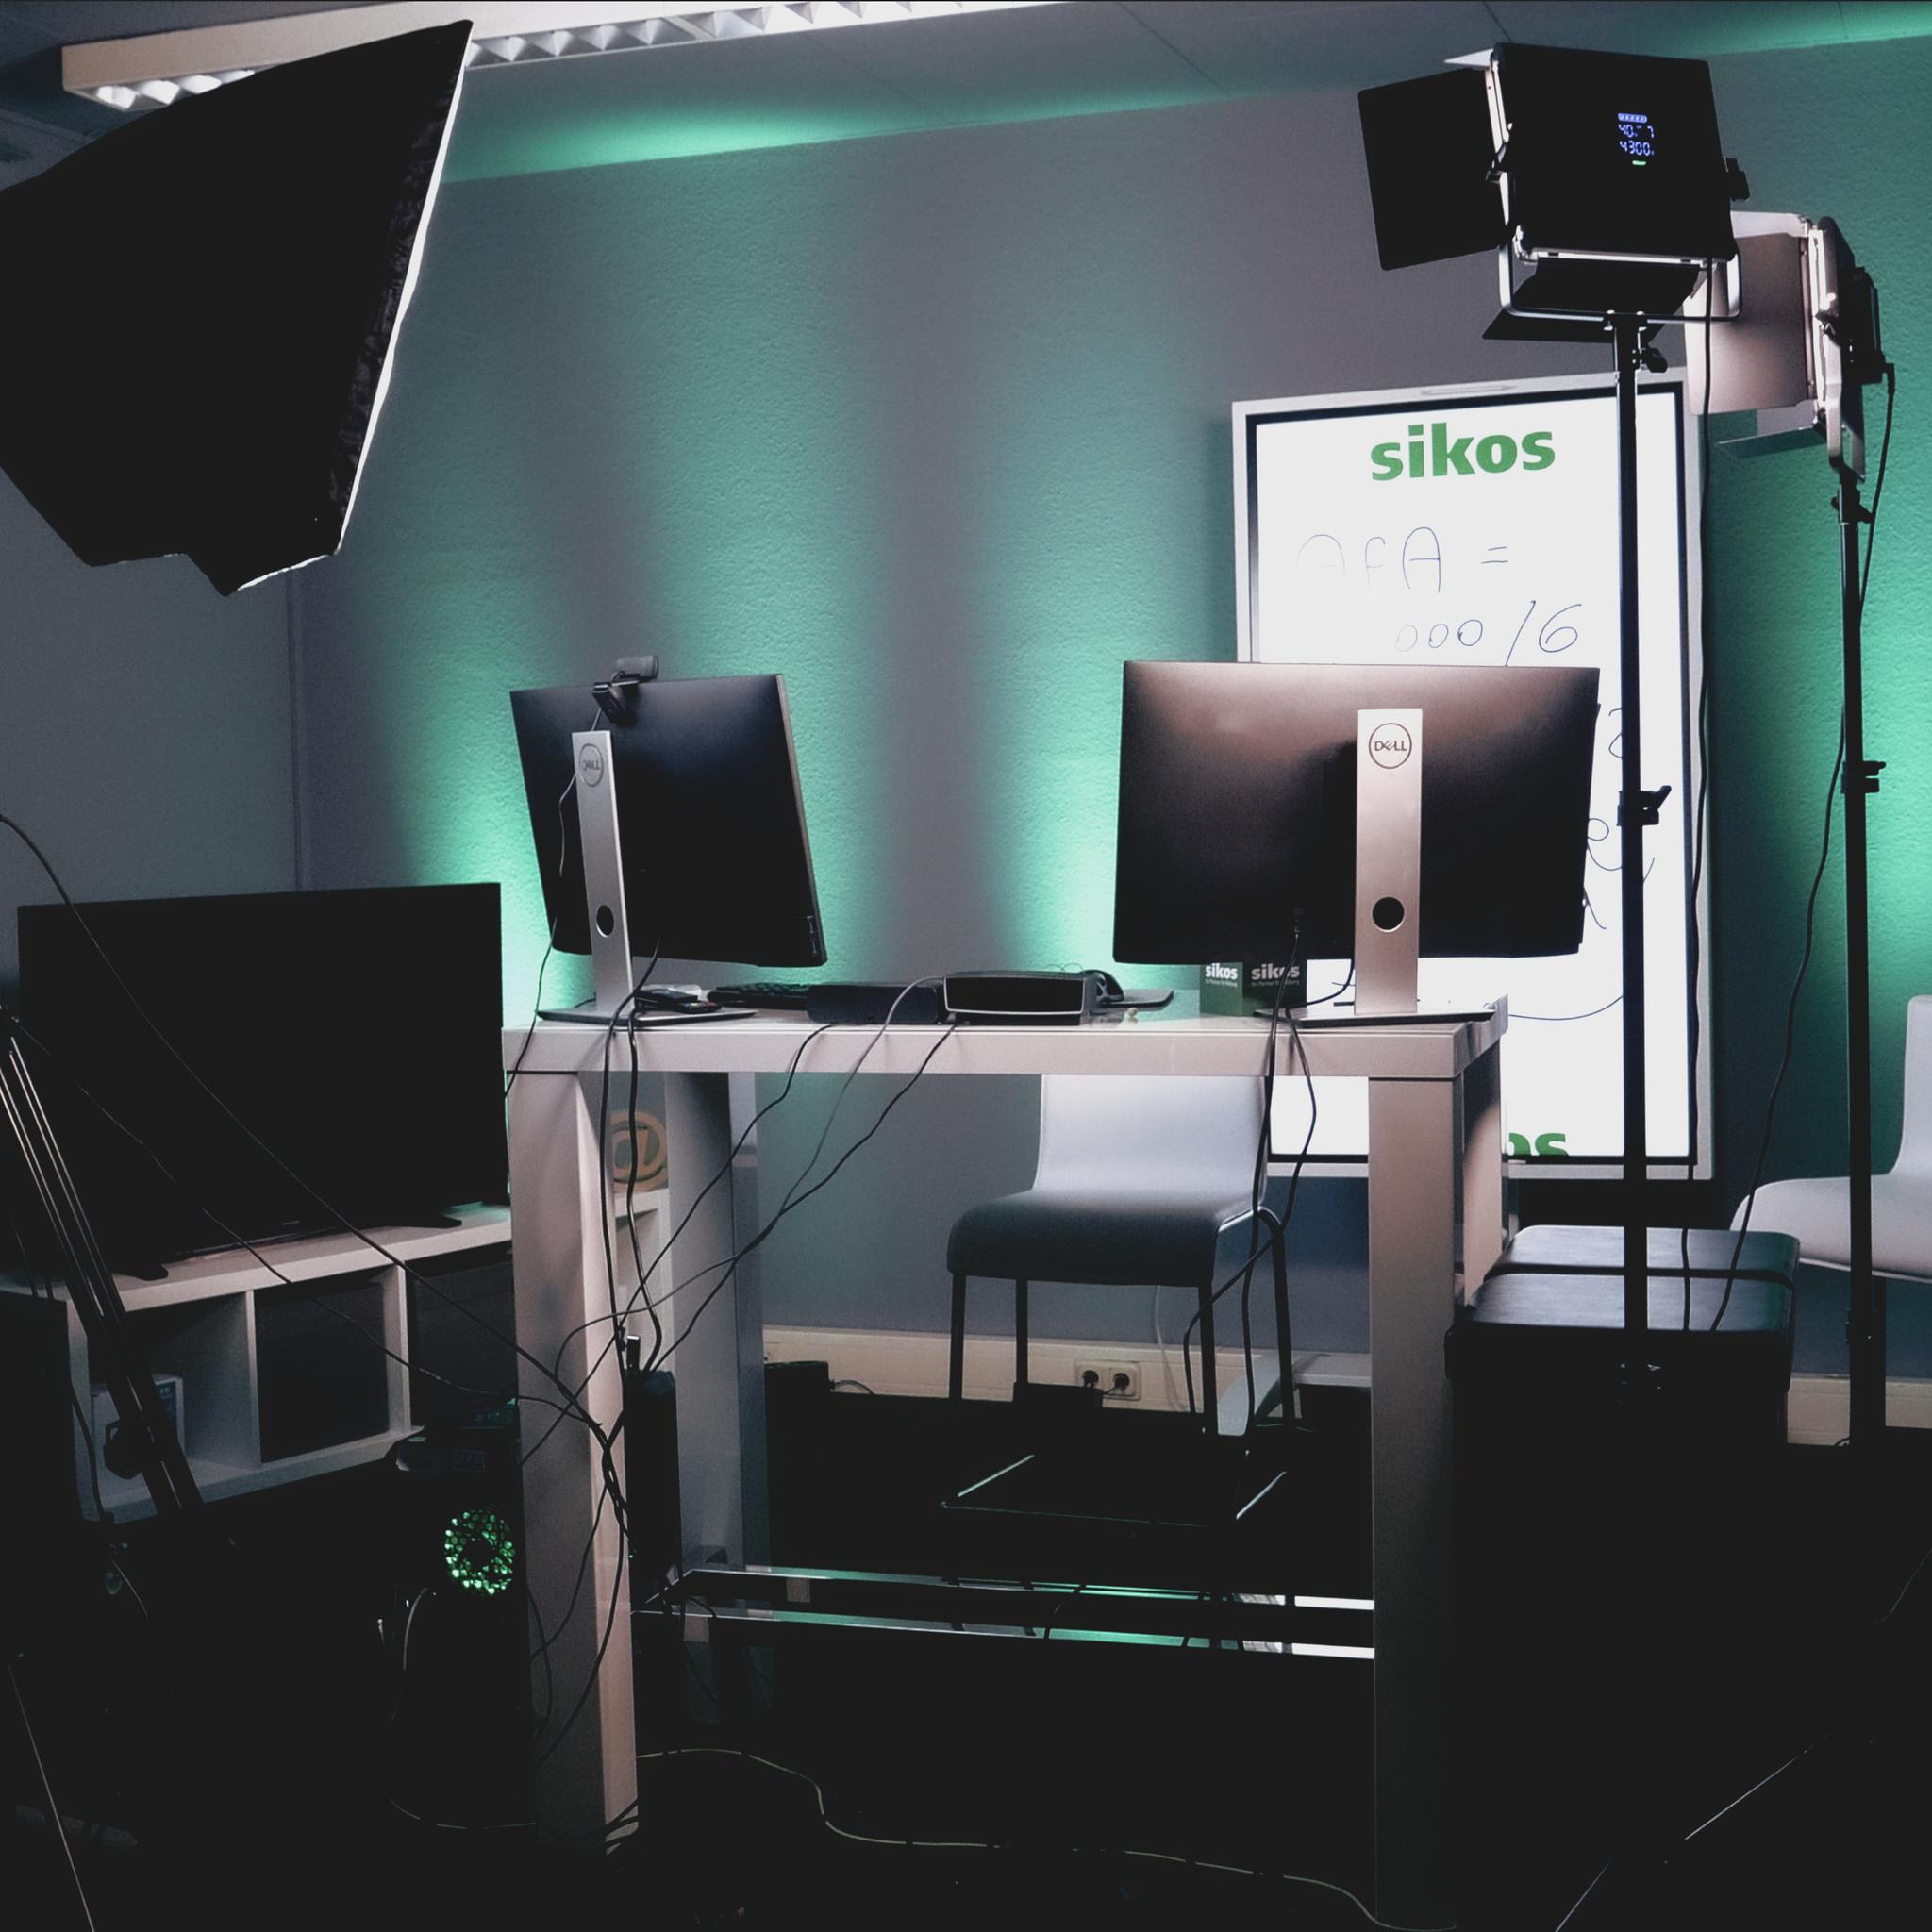 Virtuelles Aufnahme-Studio der sikos GmbH